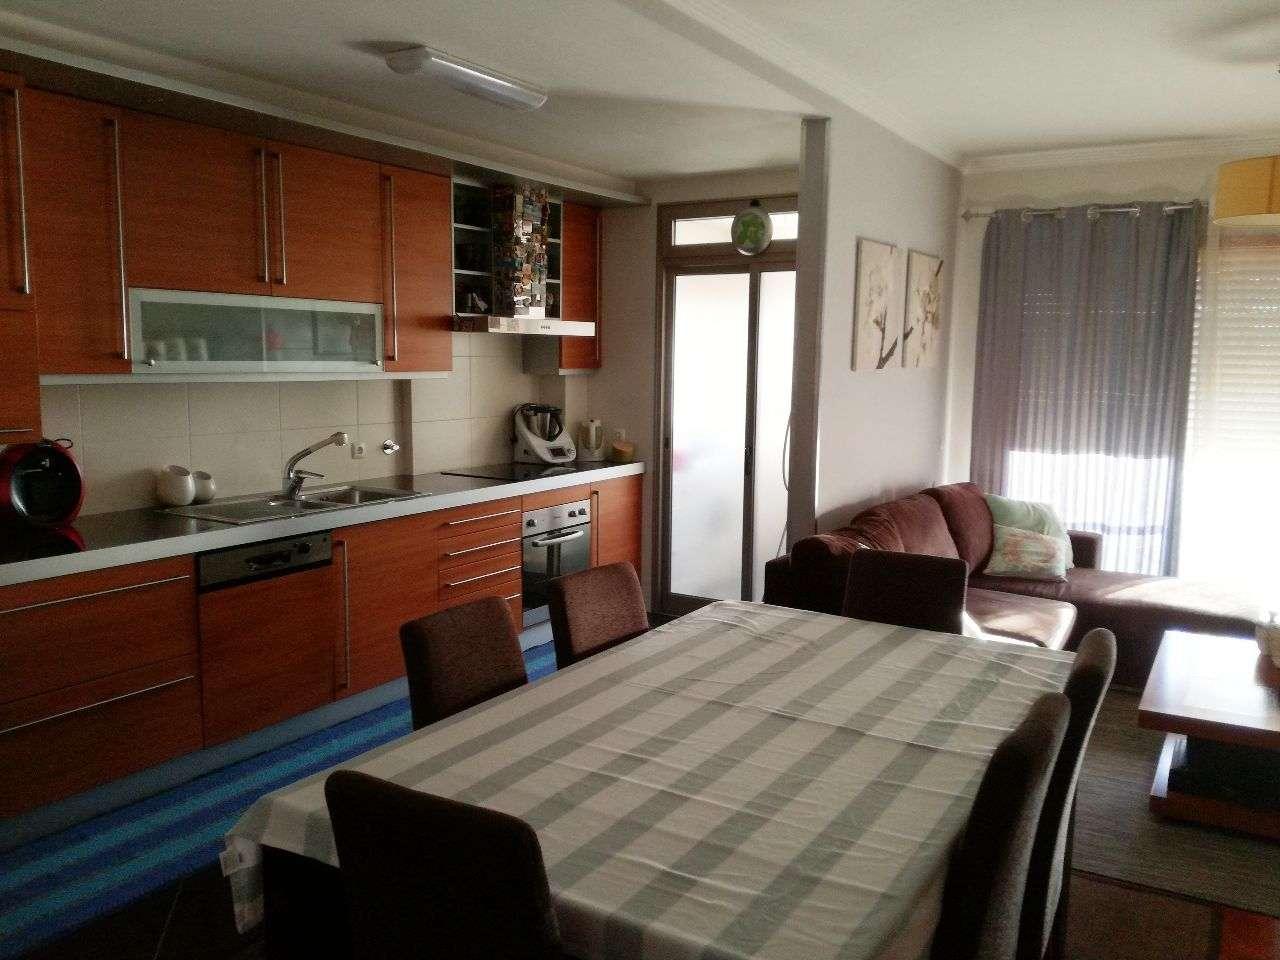 Apartamento para comprar, Esmoriz, Aveiro - Foto 2